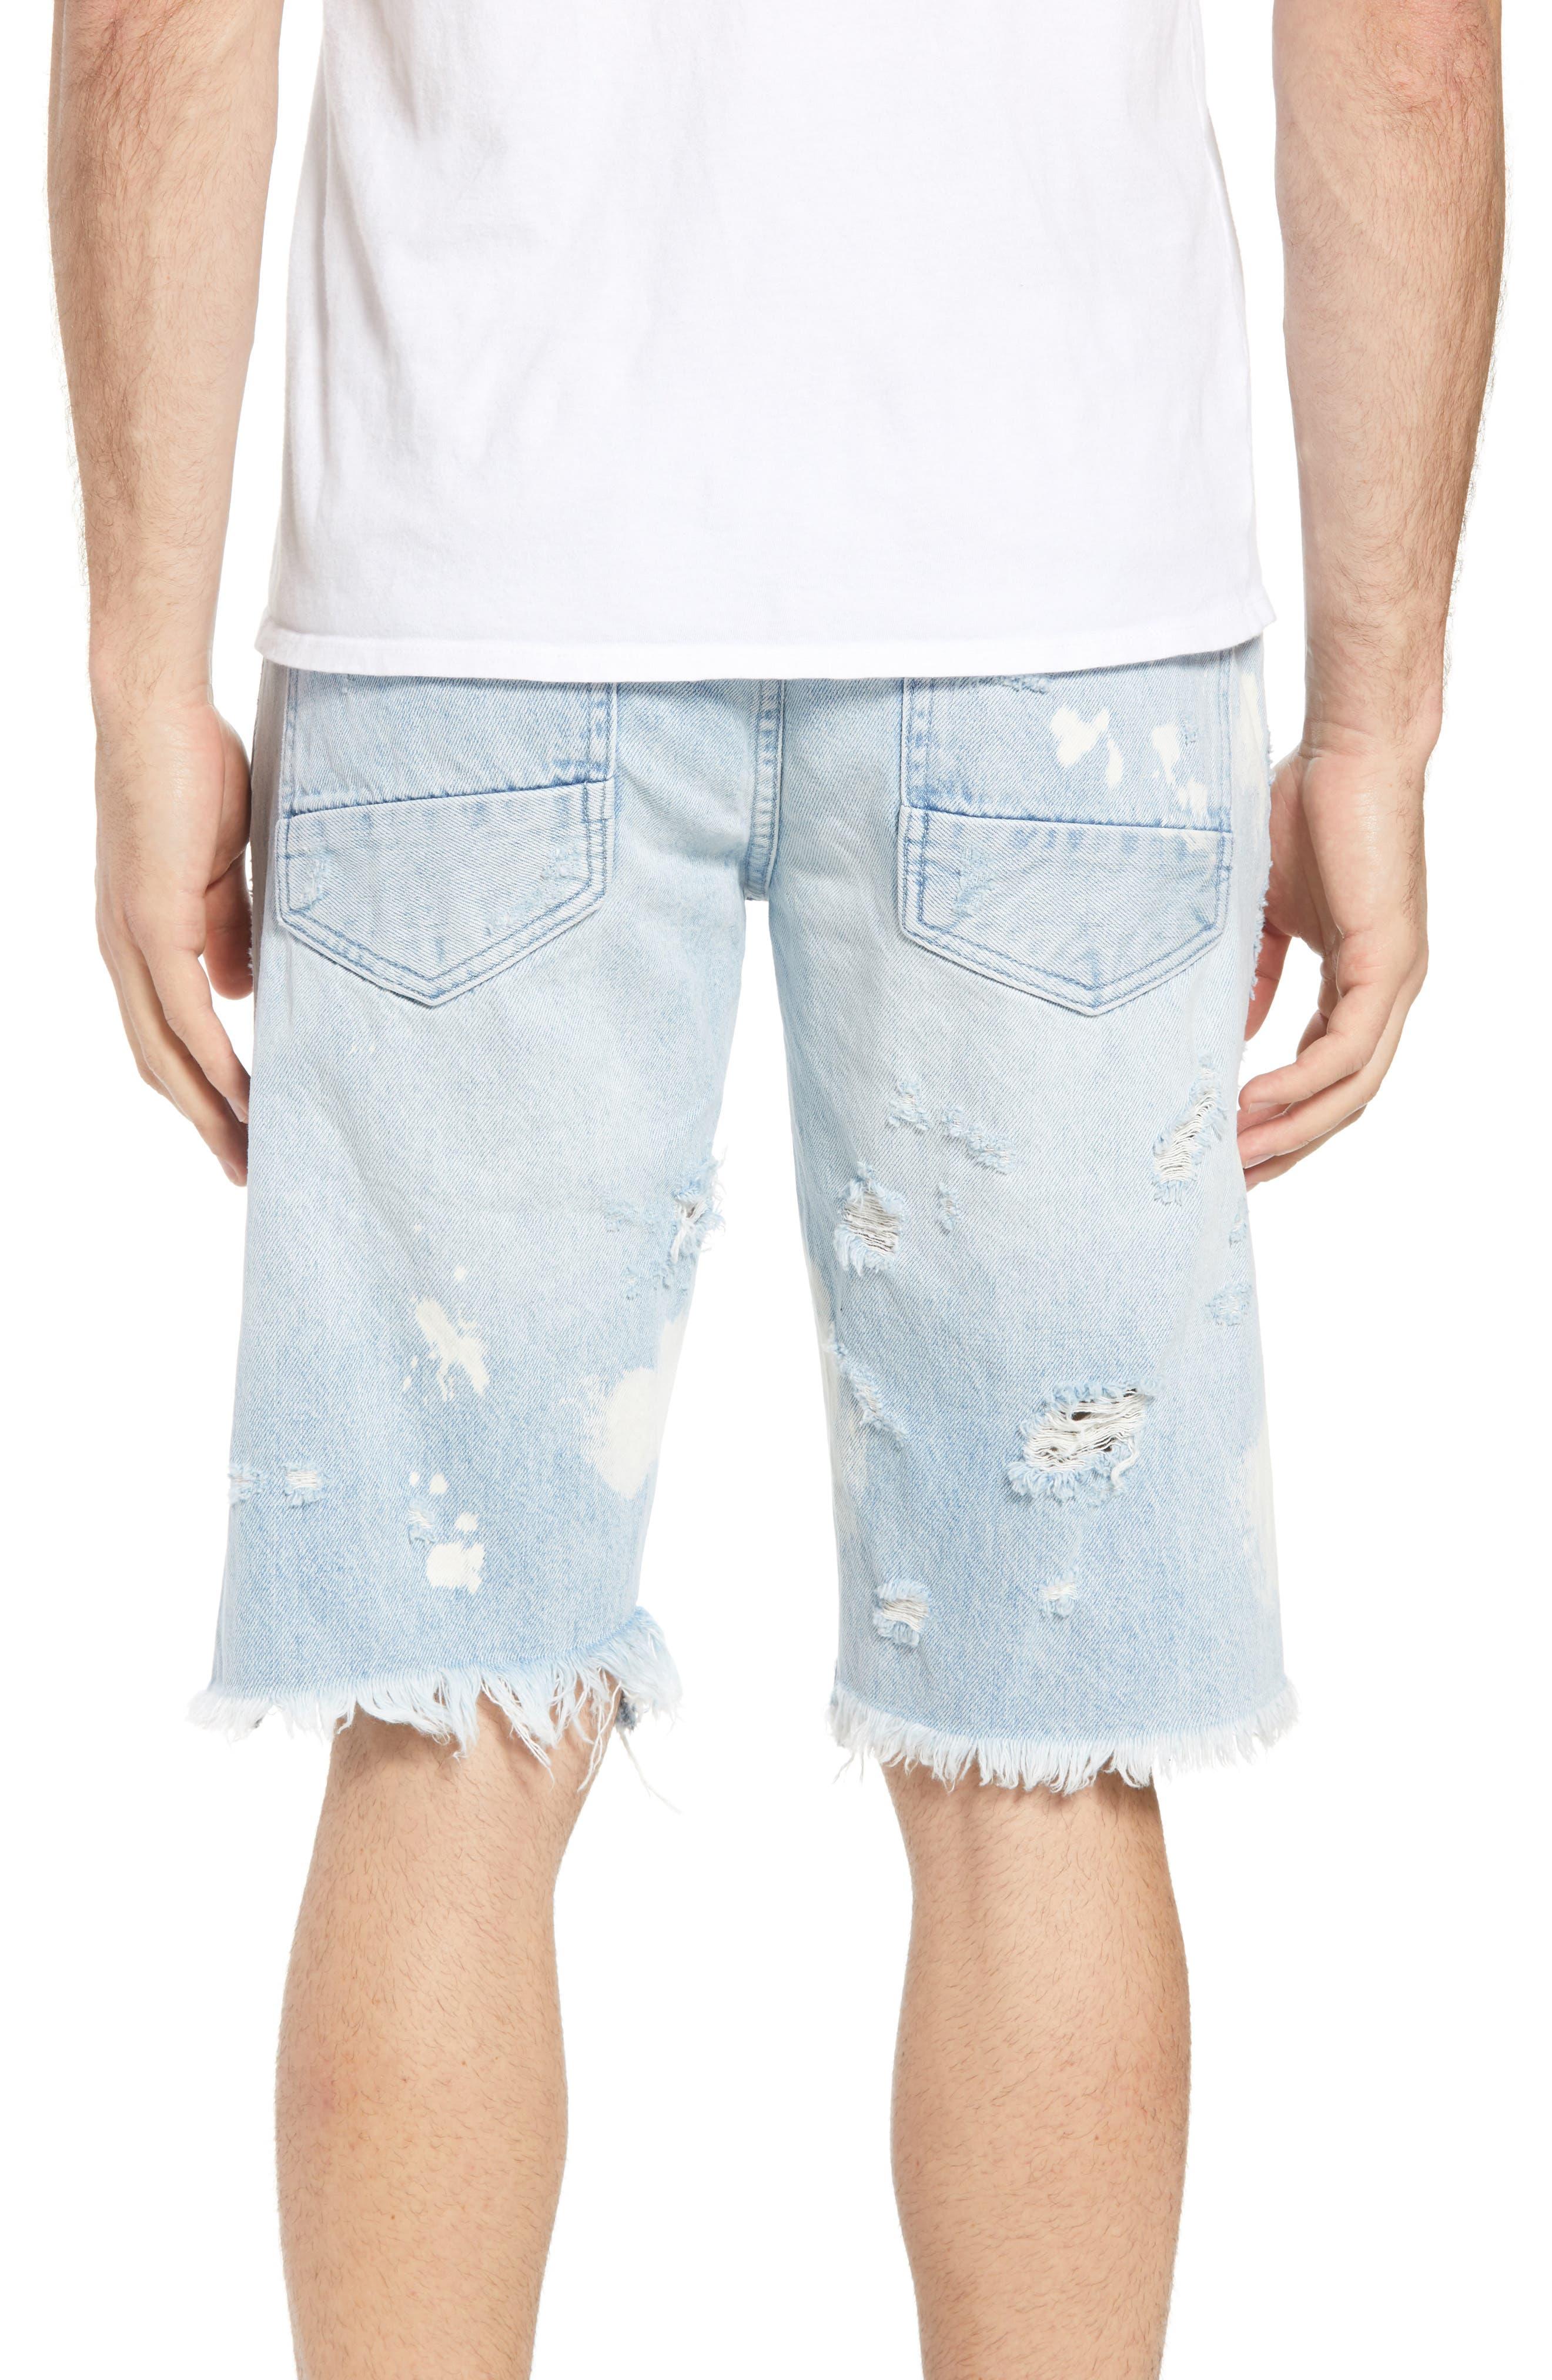 Challenger Regular Fit Shorts,                             Alternate thumbnail 2, color,                             Ultra